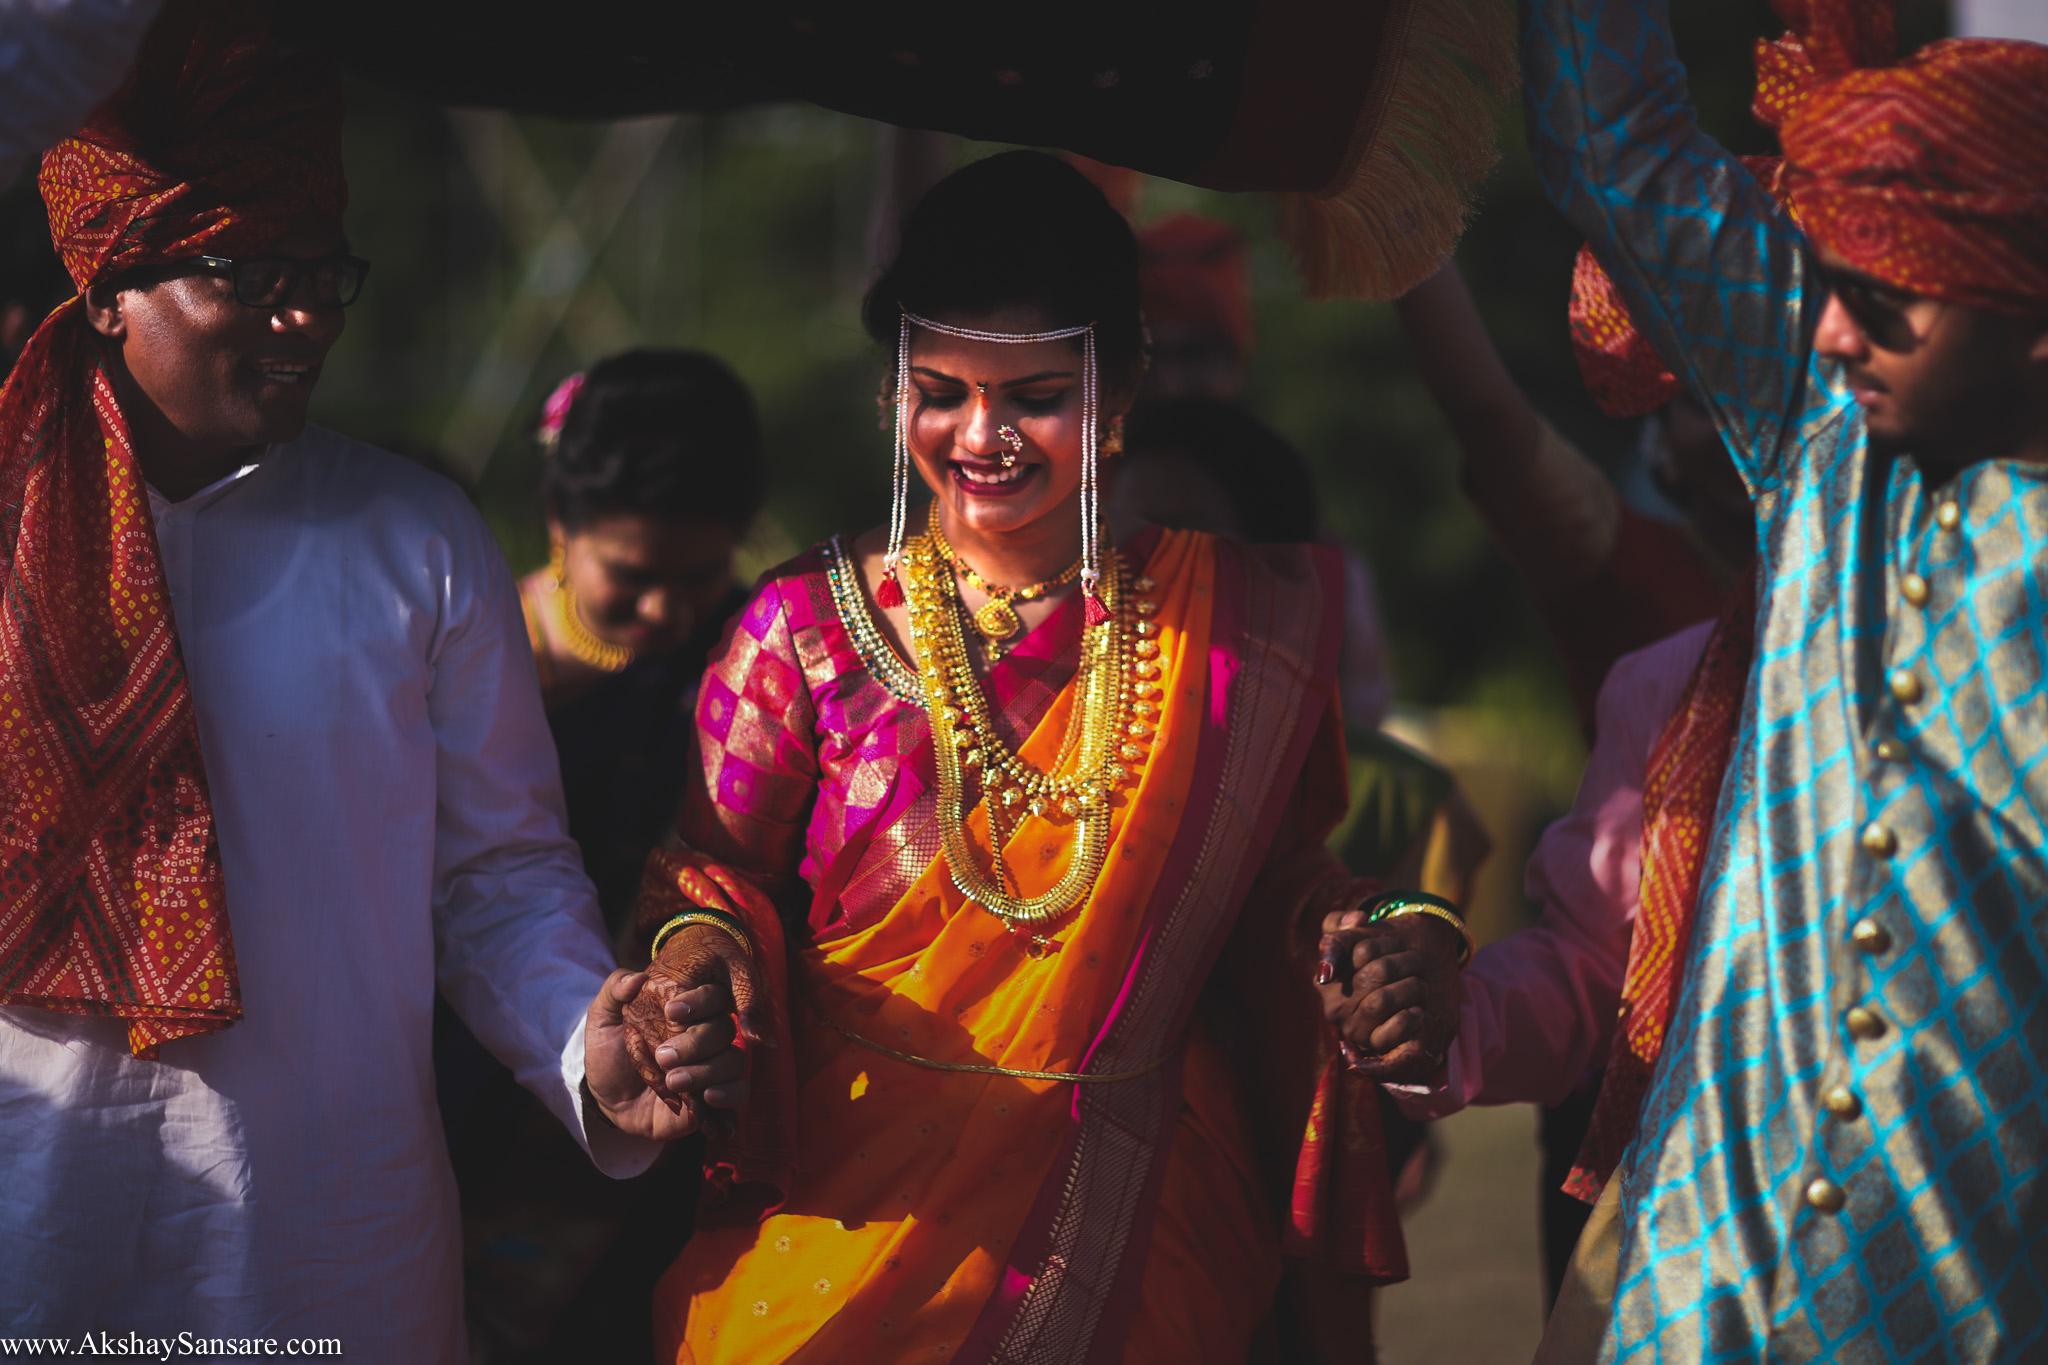 Salil x Kimaya Akshay Sansare Photography Candid wedding Photographer in mumbai best(31).jpg